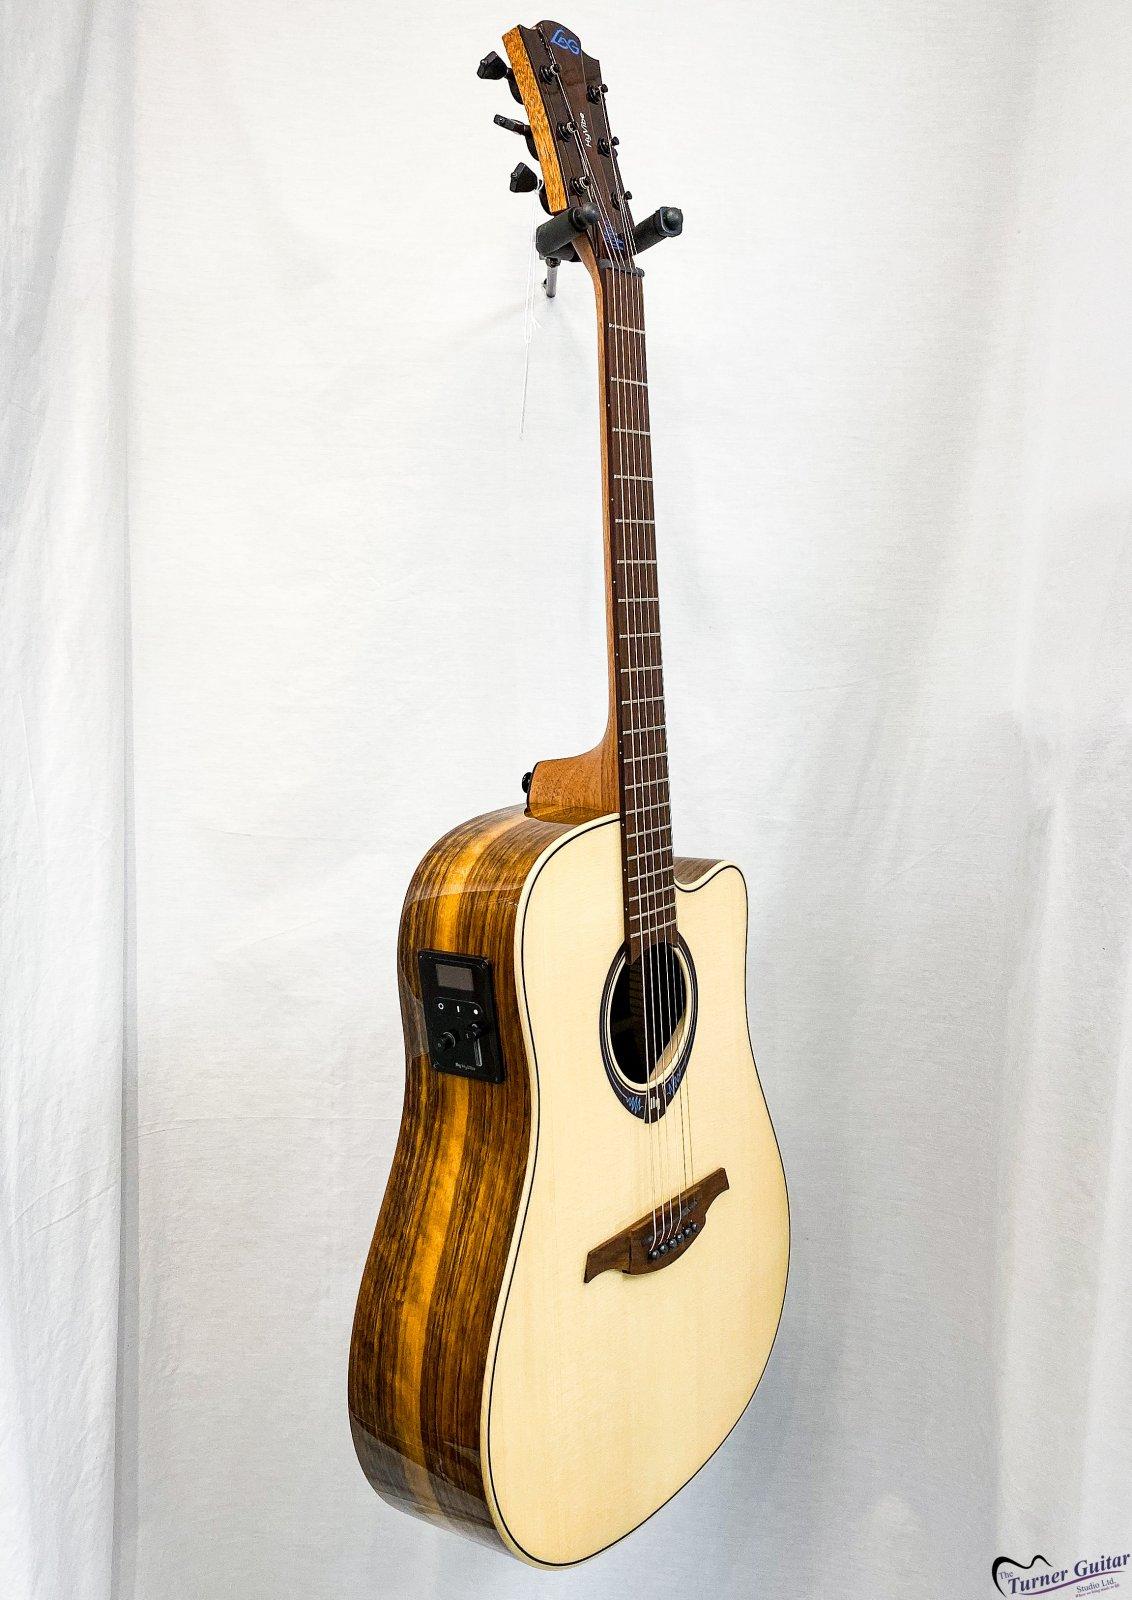 LAG Guitars Tramontane Hyvibe 20 Glossy Engelmann Spruce Top - Smart Guitar - Bluetooth & Effects